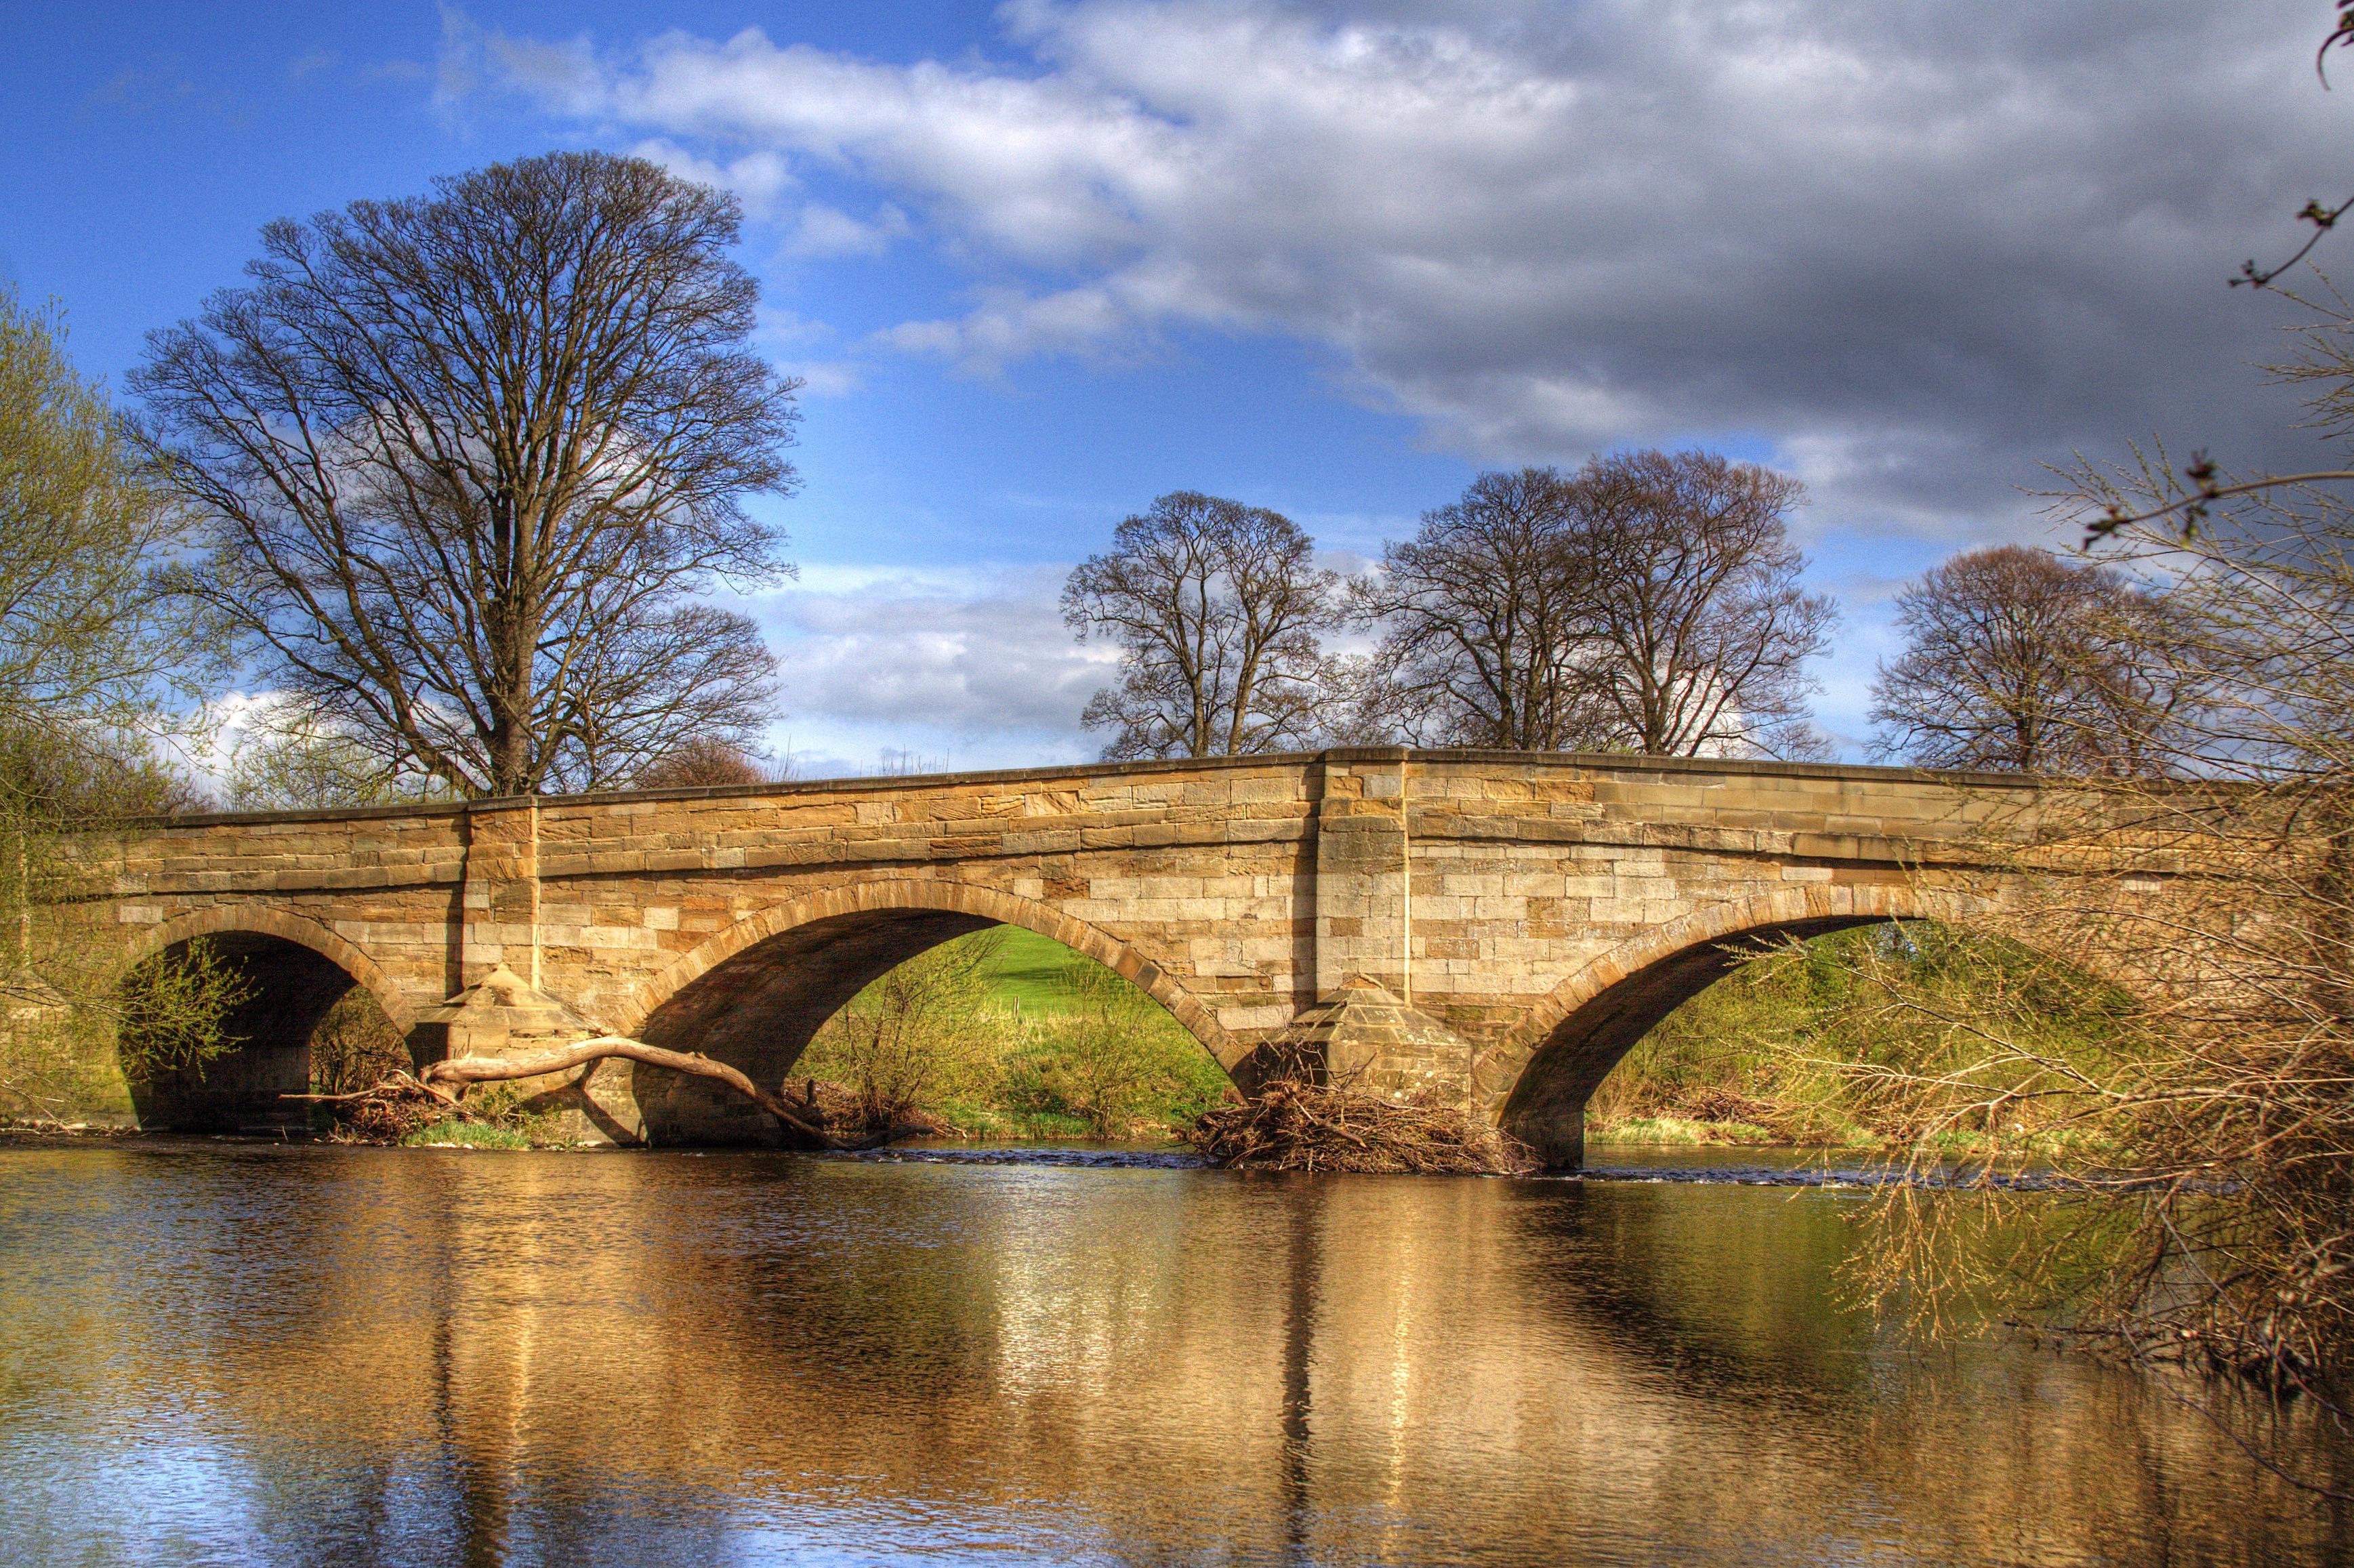 bridge on the river - photo #34